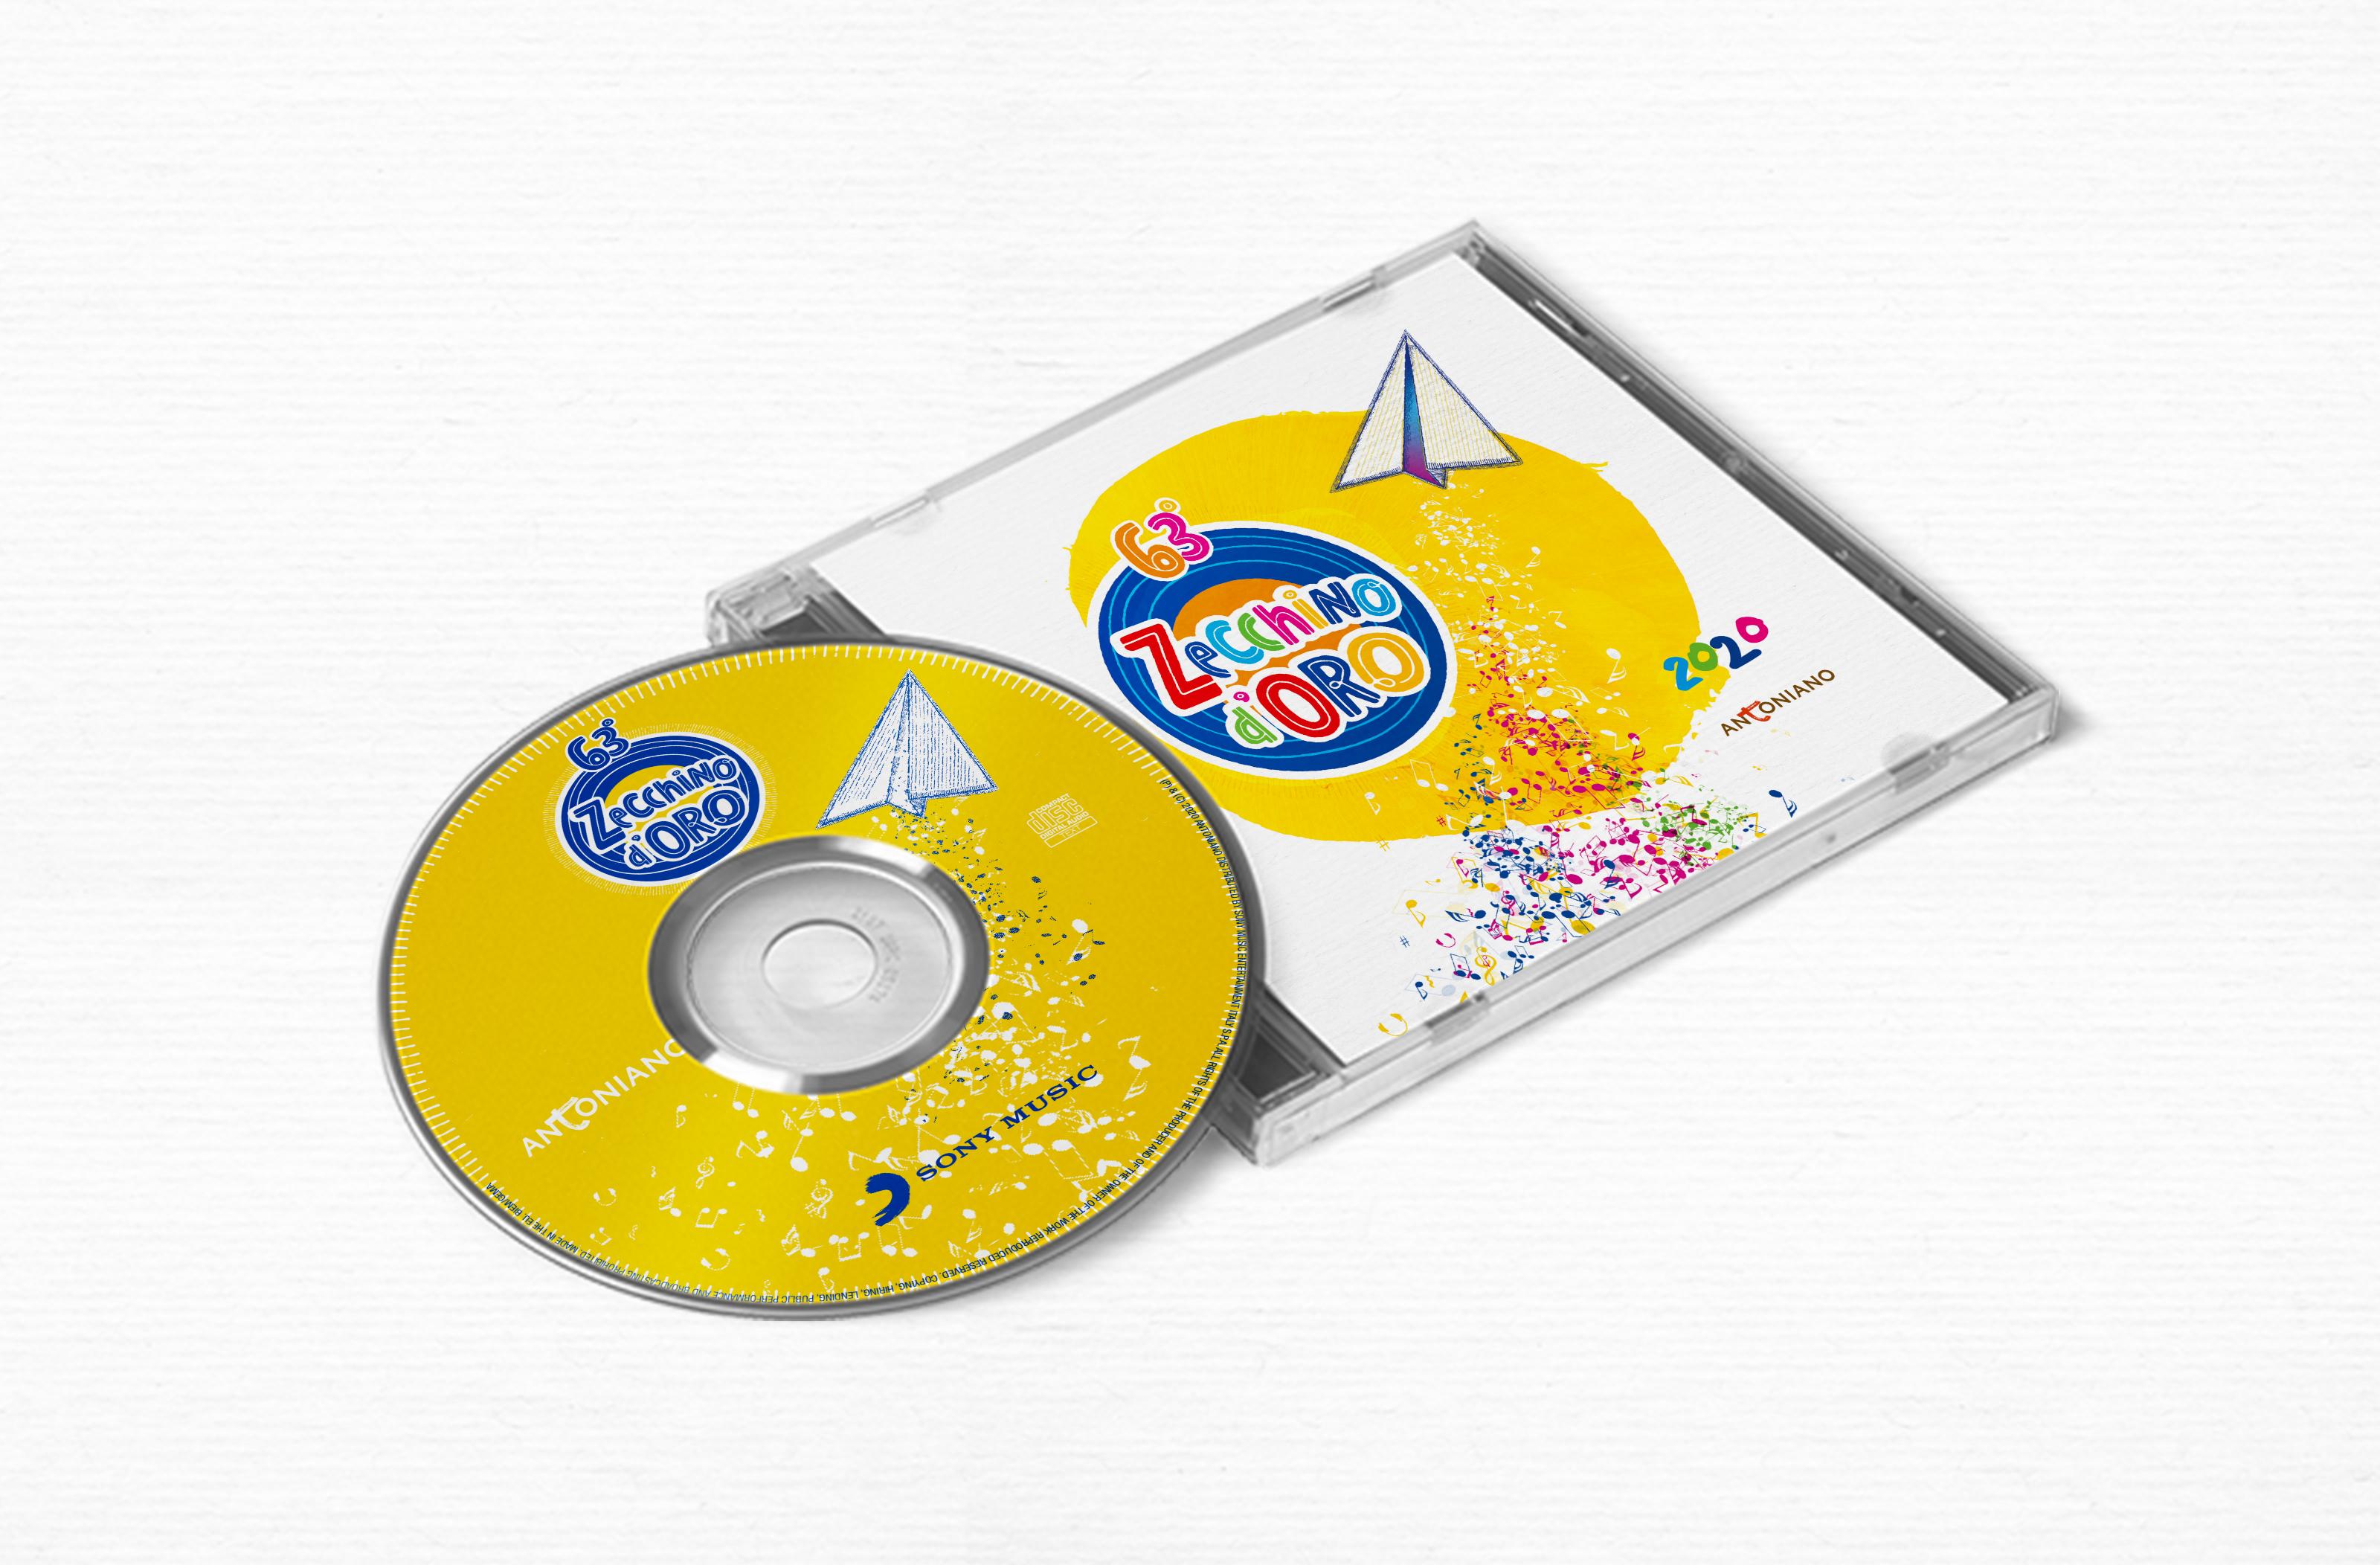 2020 Zecchino 63 CD